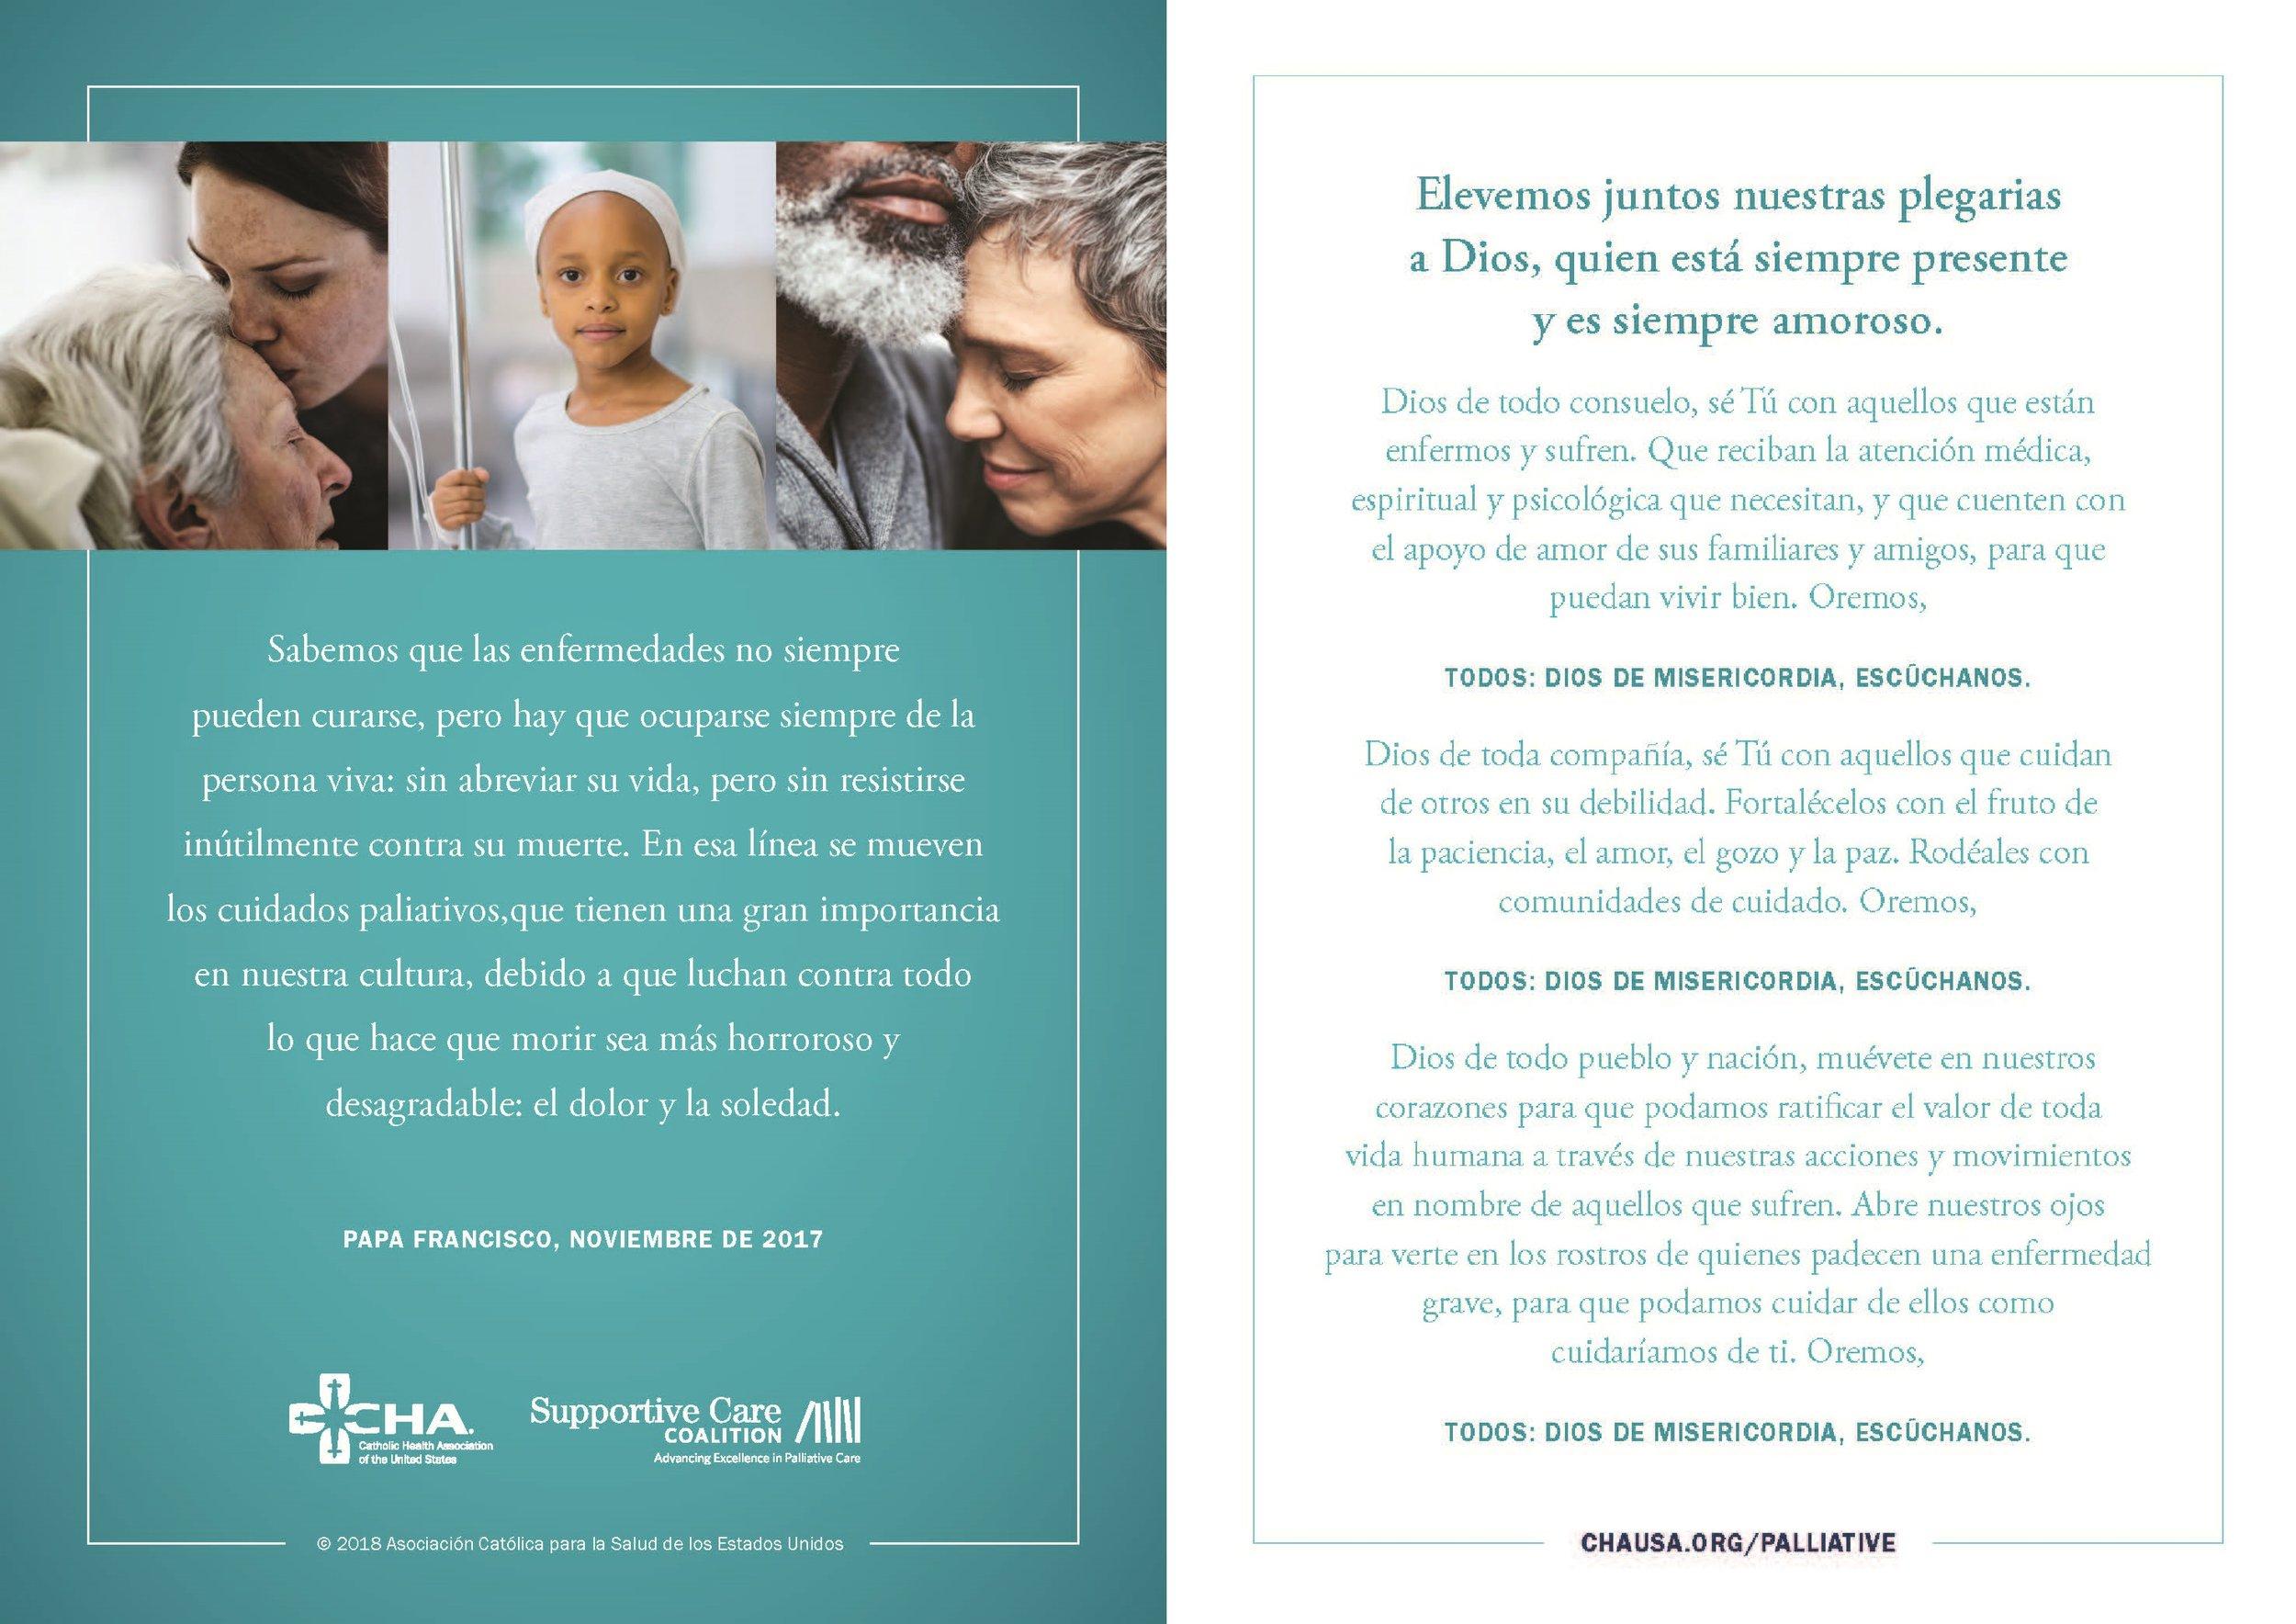 CHA_H+PC_PrayerCard_SPANISH_Page_1 and 2.jpg